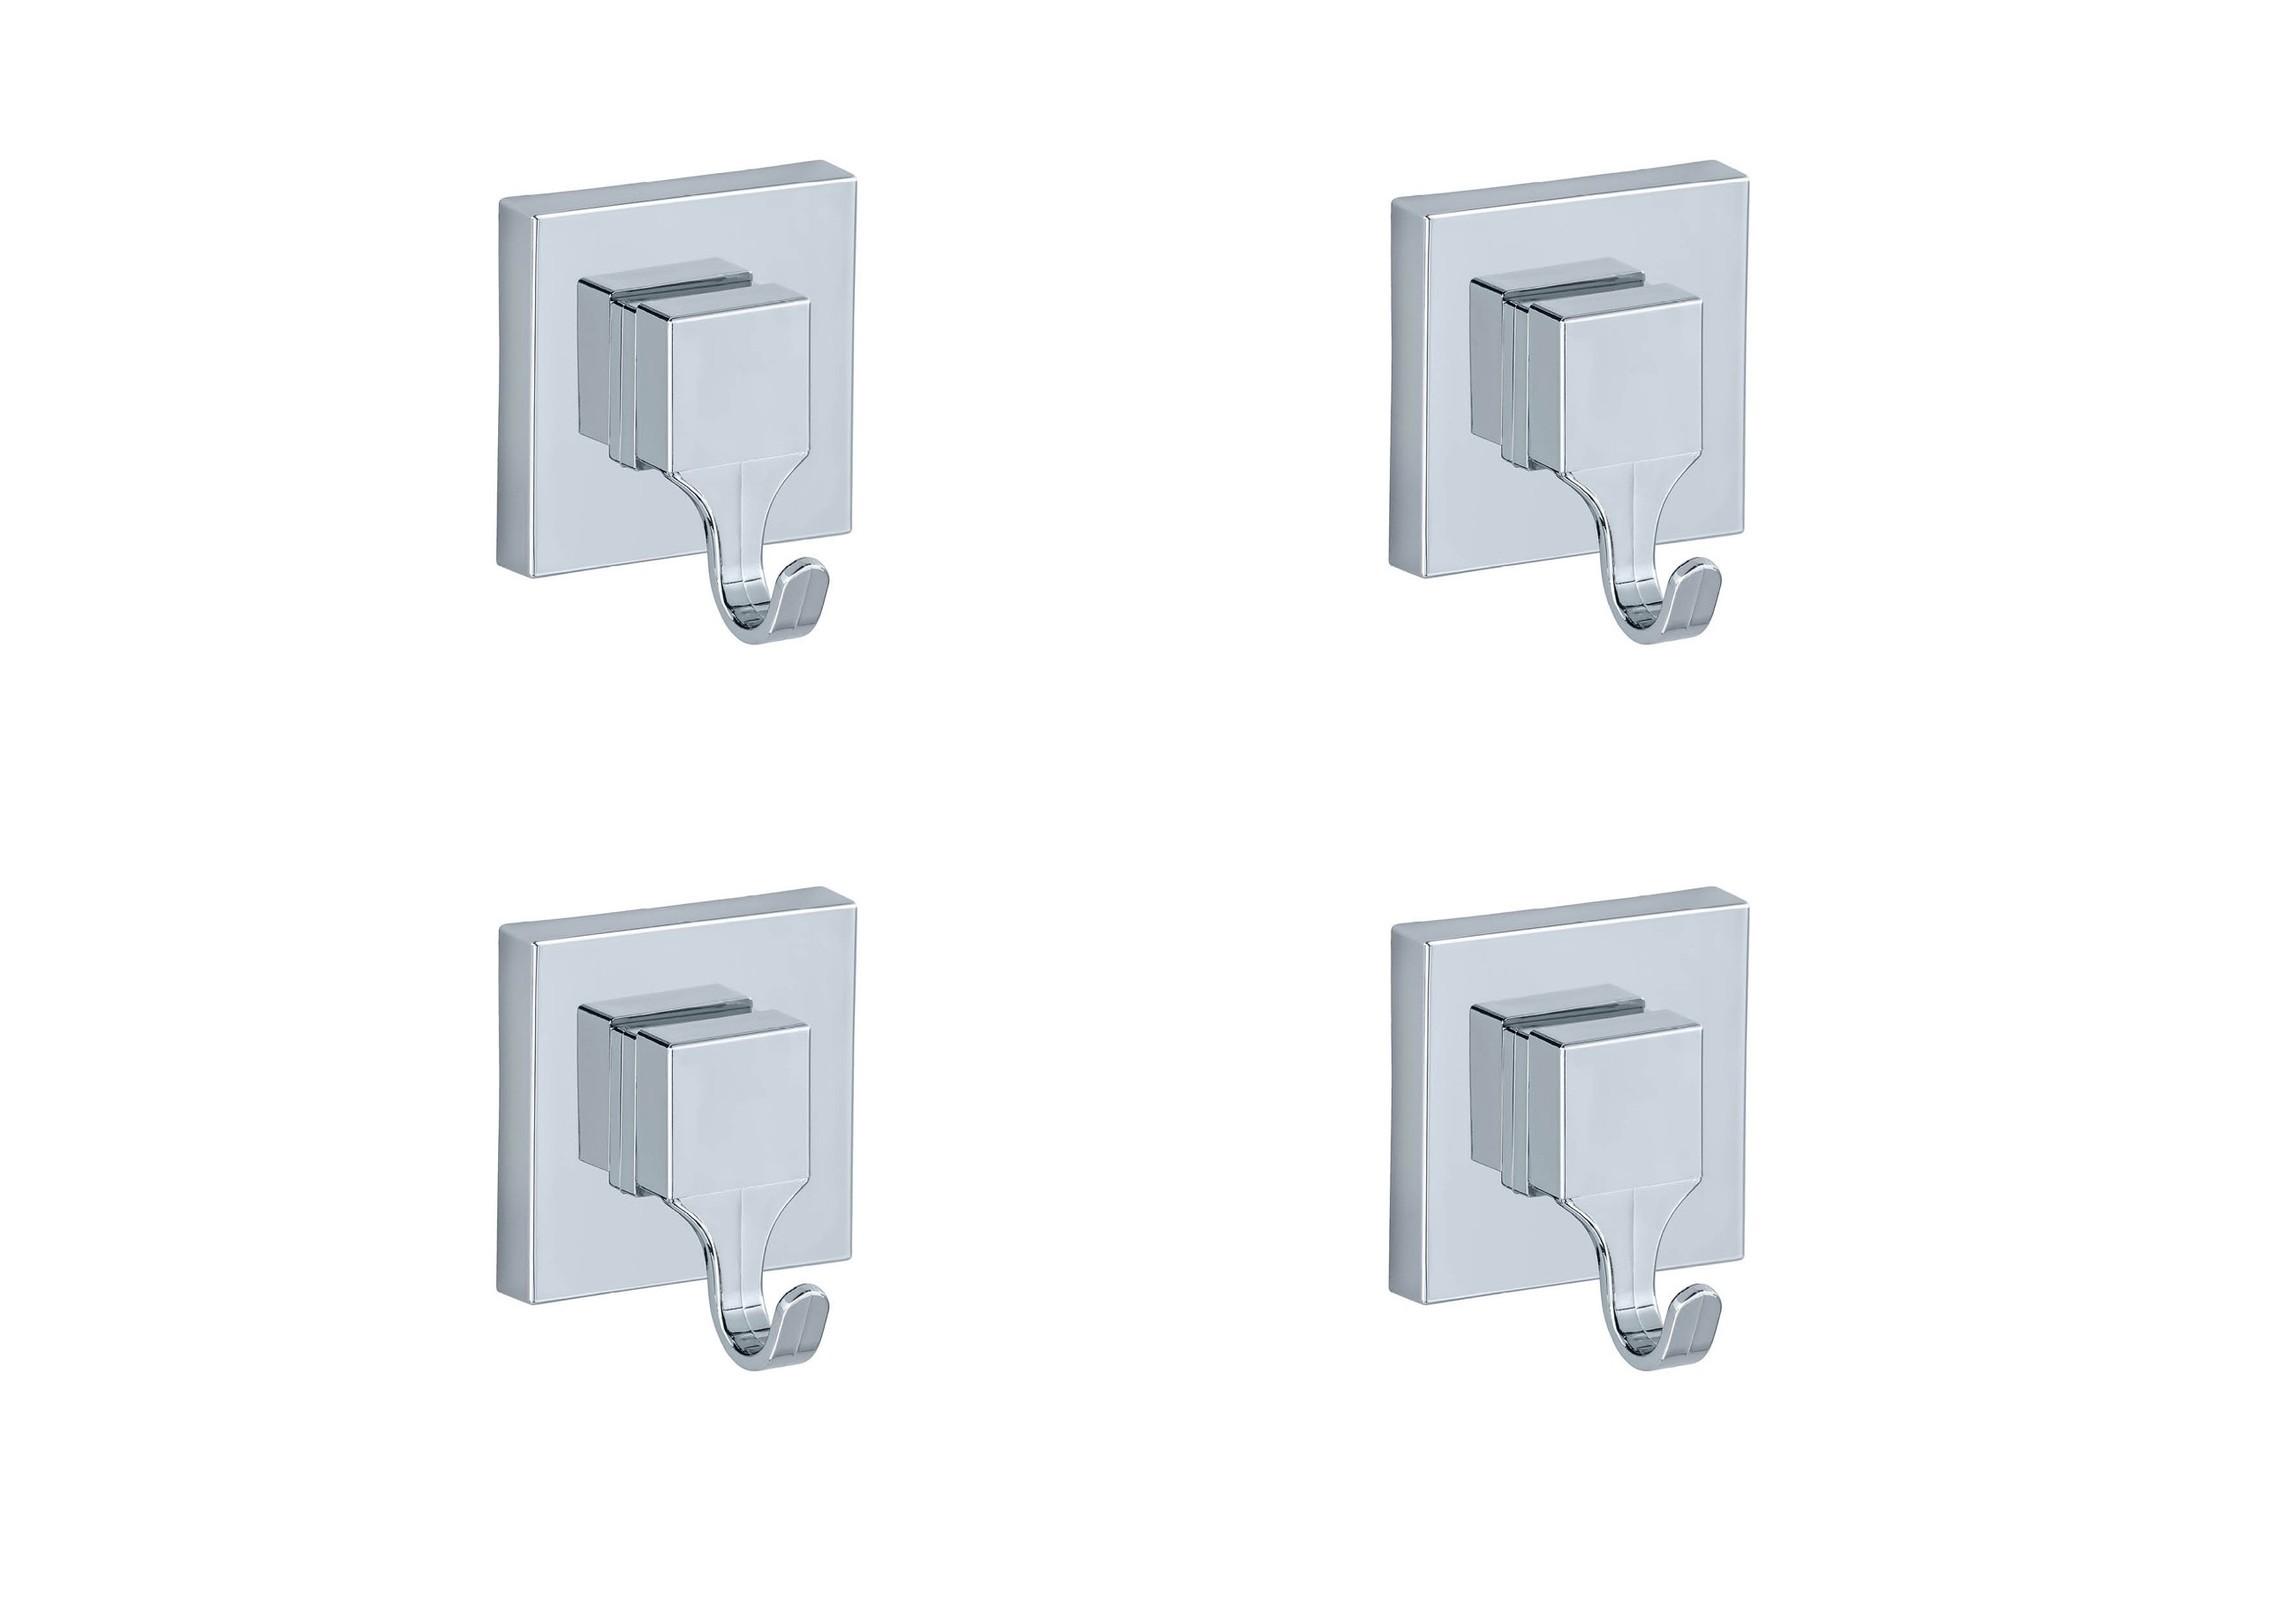 Wenko Vacuum-Loc® Wandhaken Quadro, 4er Set, Befestigen ohne bohren